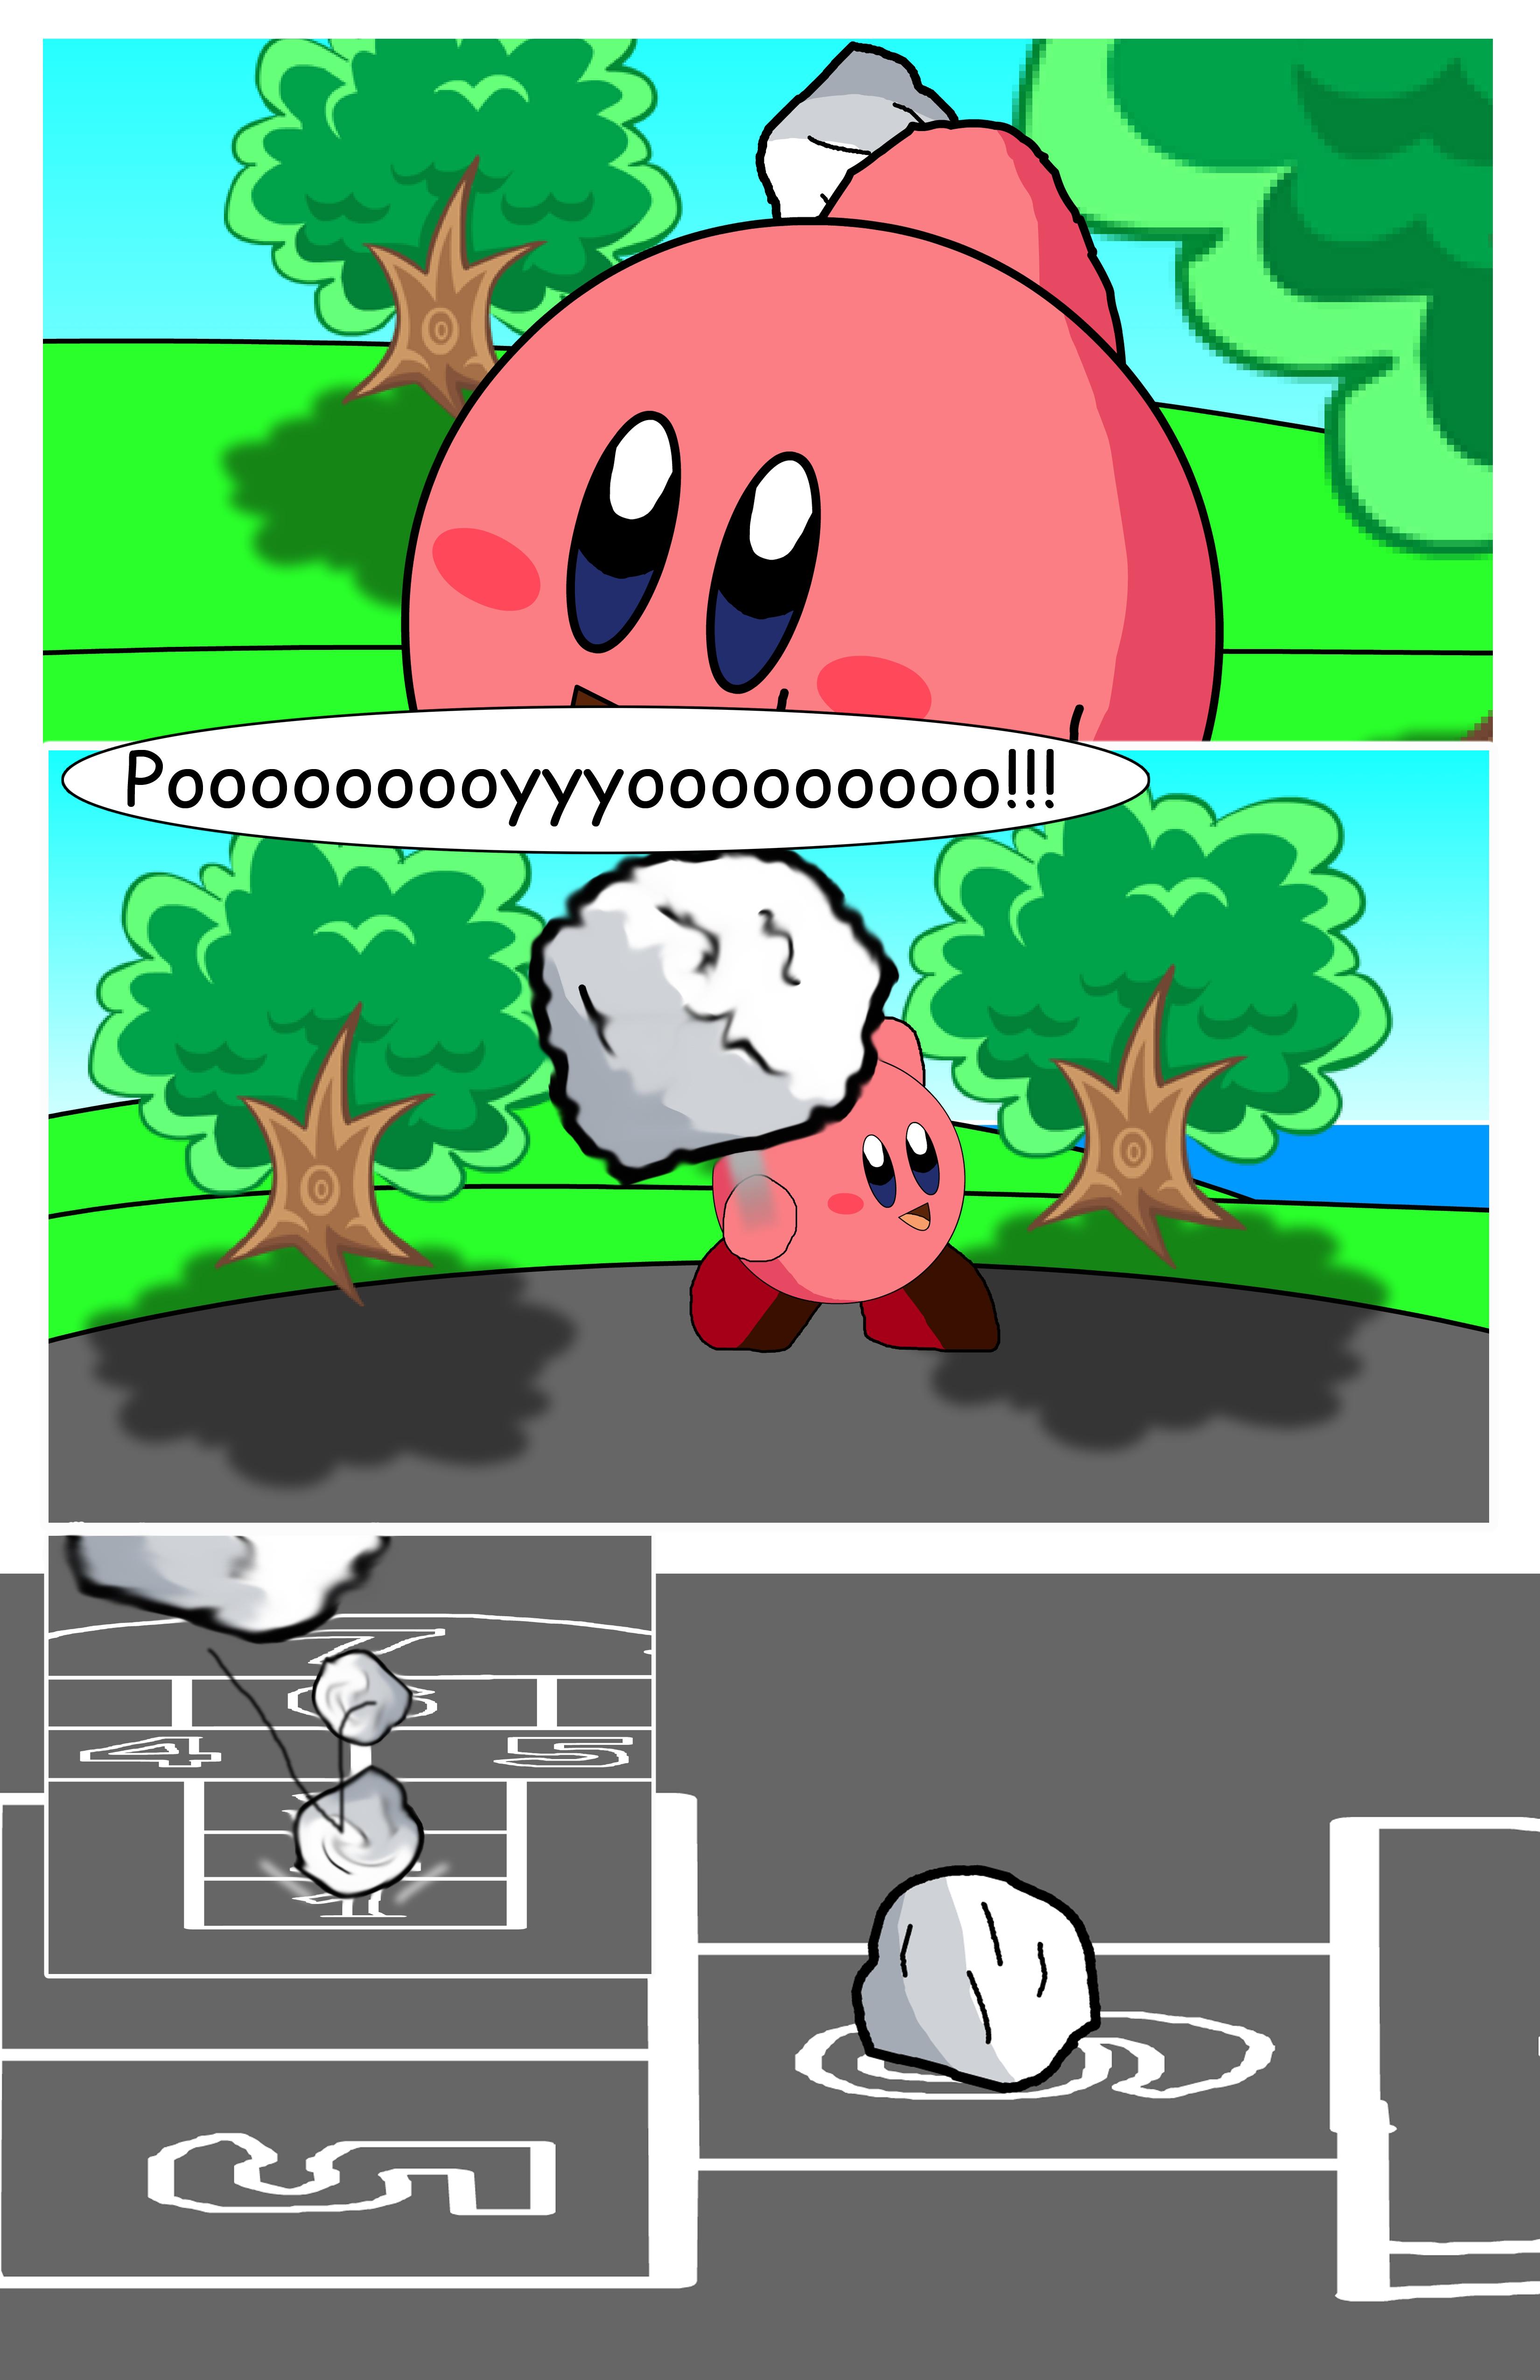 Kirby - WoA Page 7 by KingAsylus91